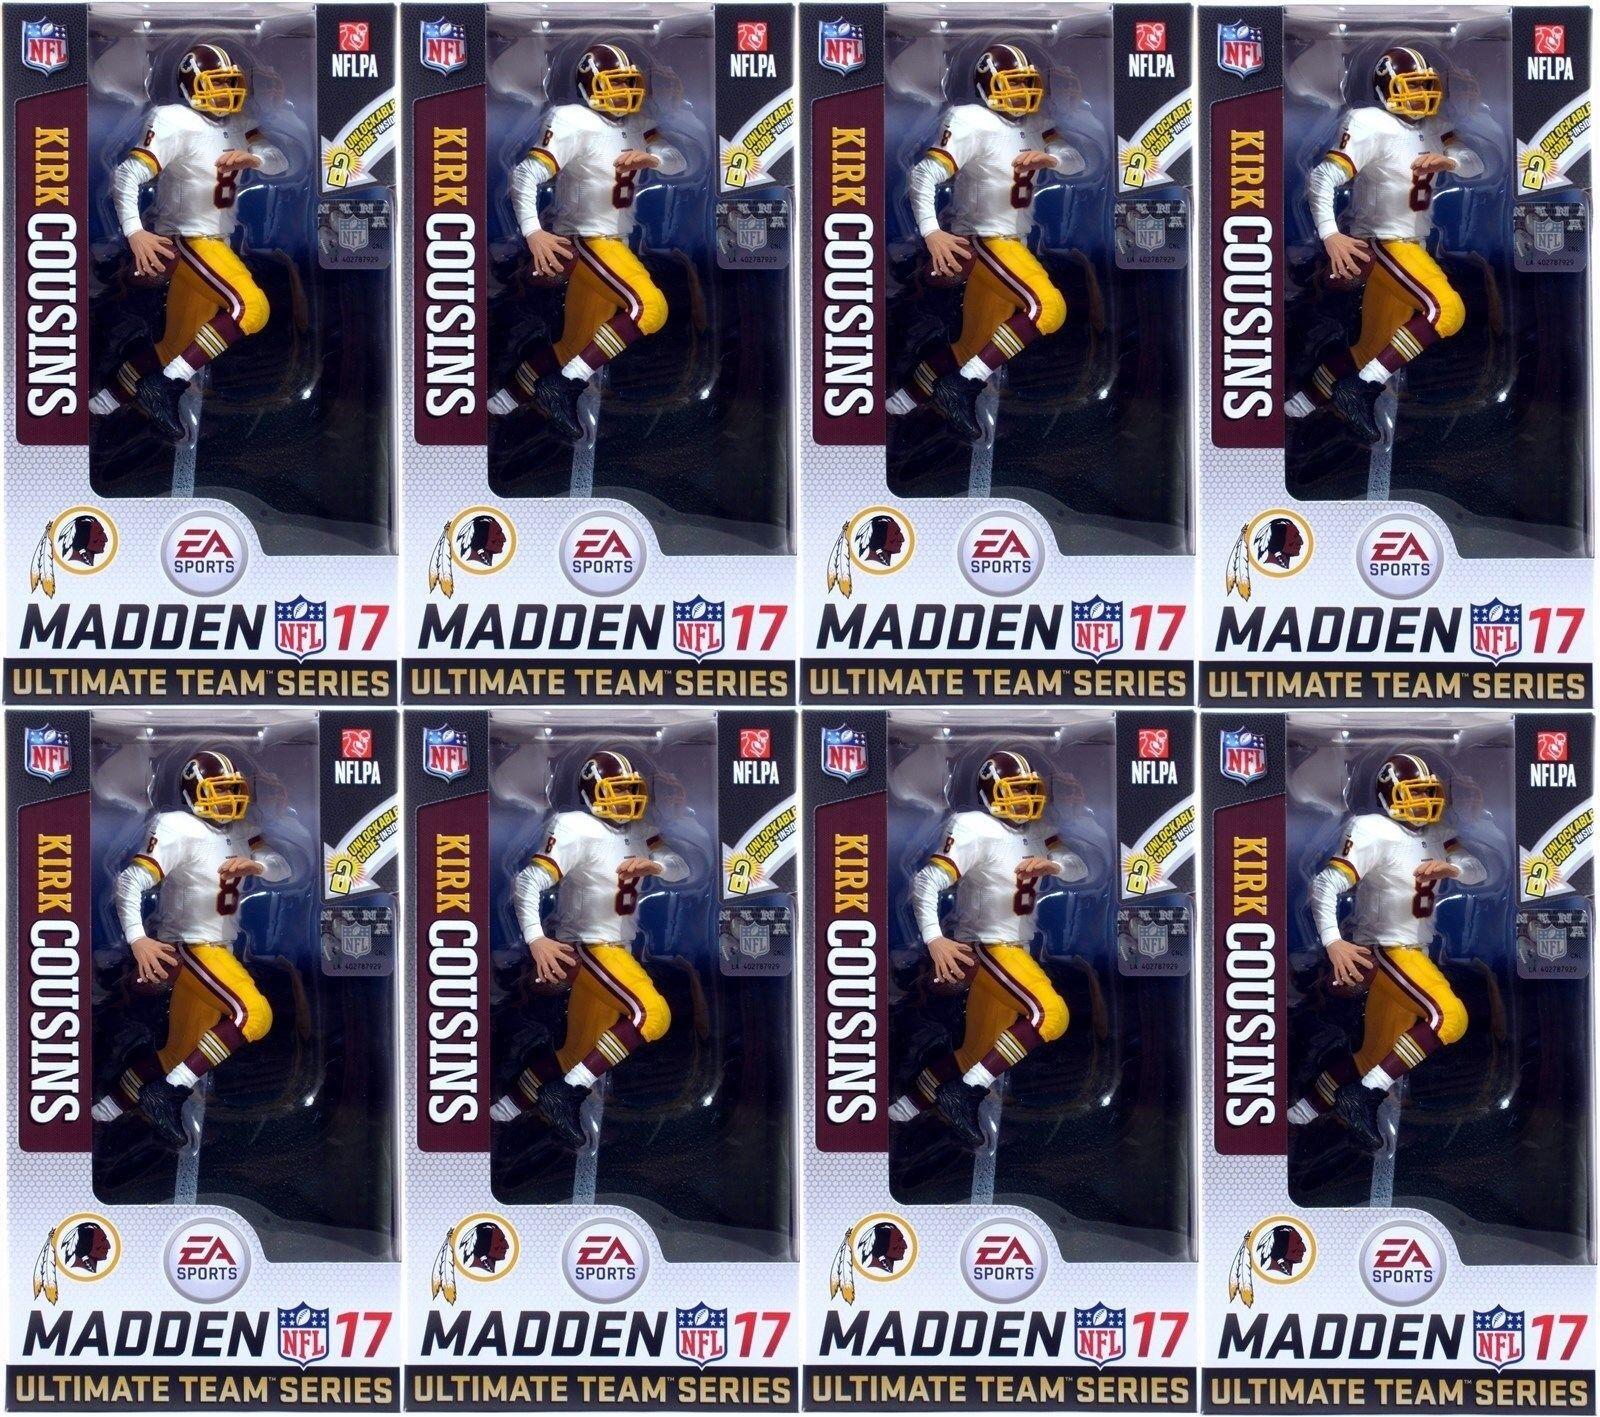 McFarlane EA Sports Madden NFL 17 Ultimate Team Serie 3 Kirk primos-Lote de 8